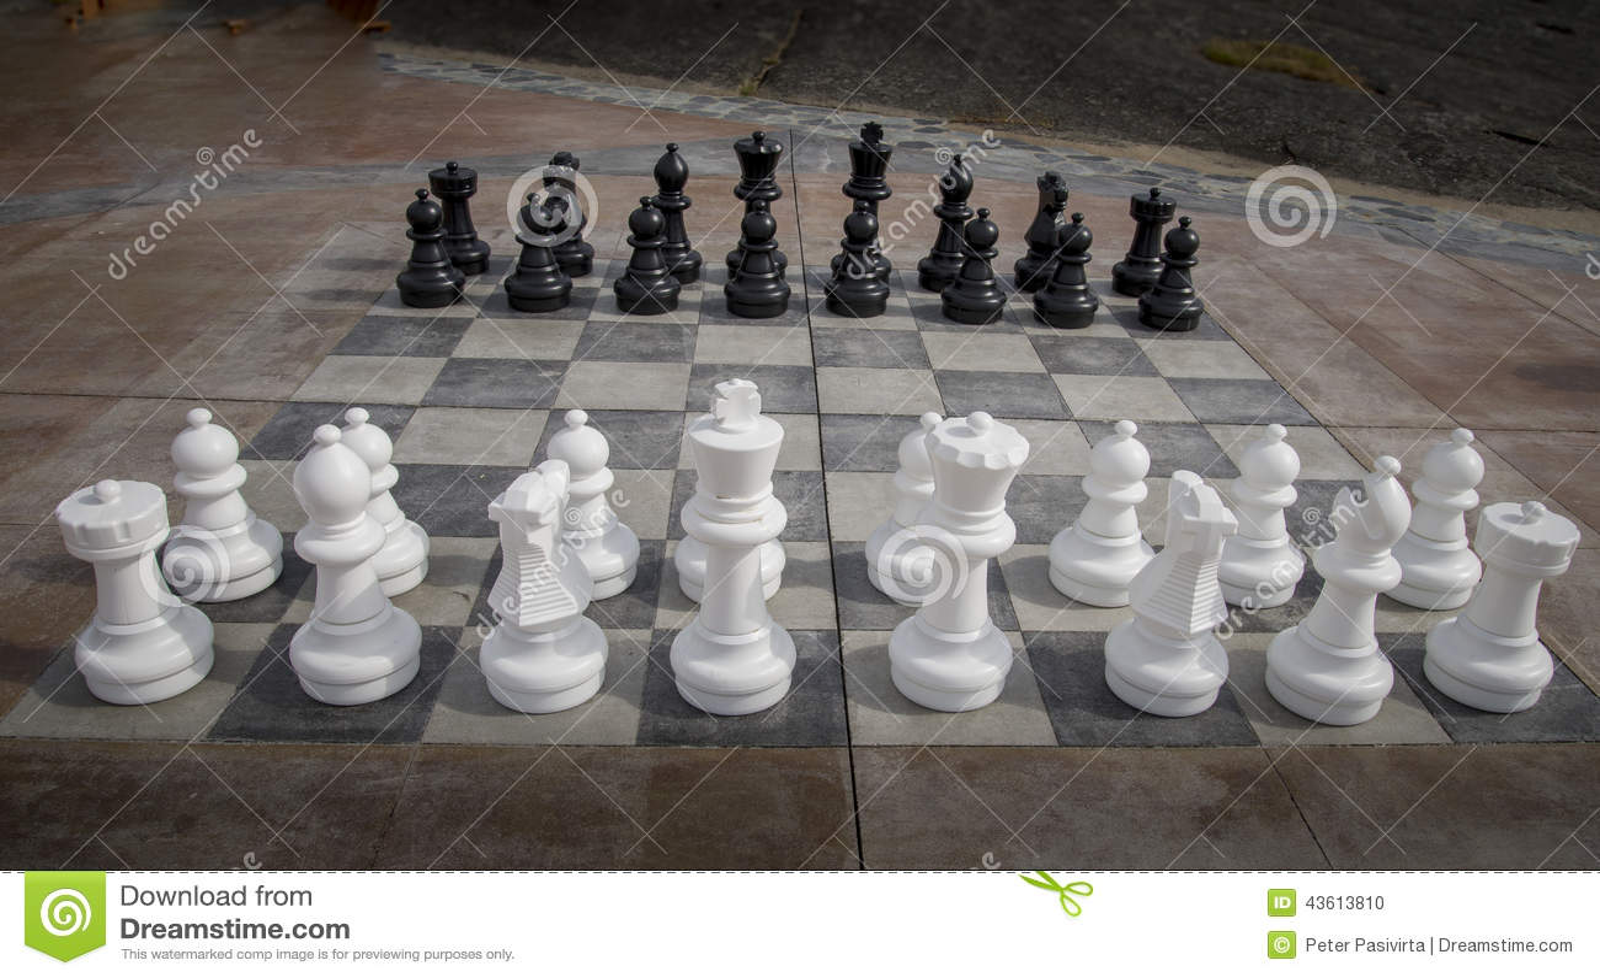 Schackmän utomhus